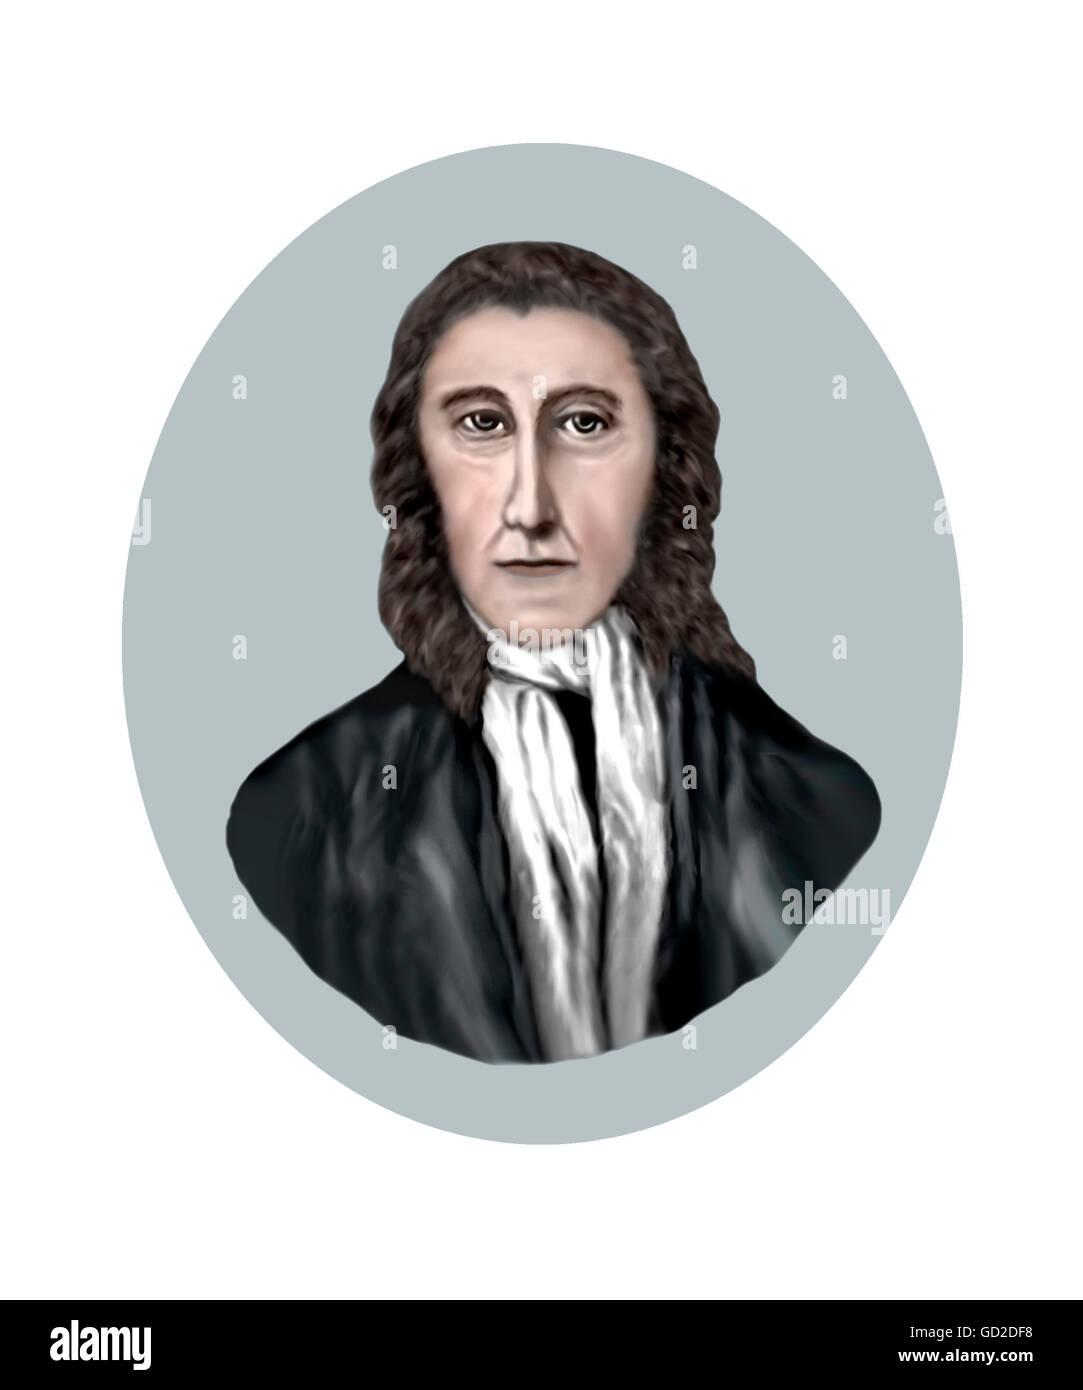 Robert Hooke, 1635-1703, Scientist, Natural Philosopher, Architect, Polymath, Portrait based on written descriptions - Stock Image